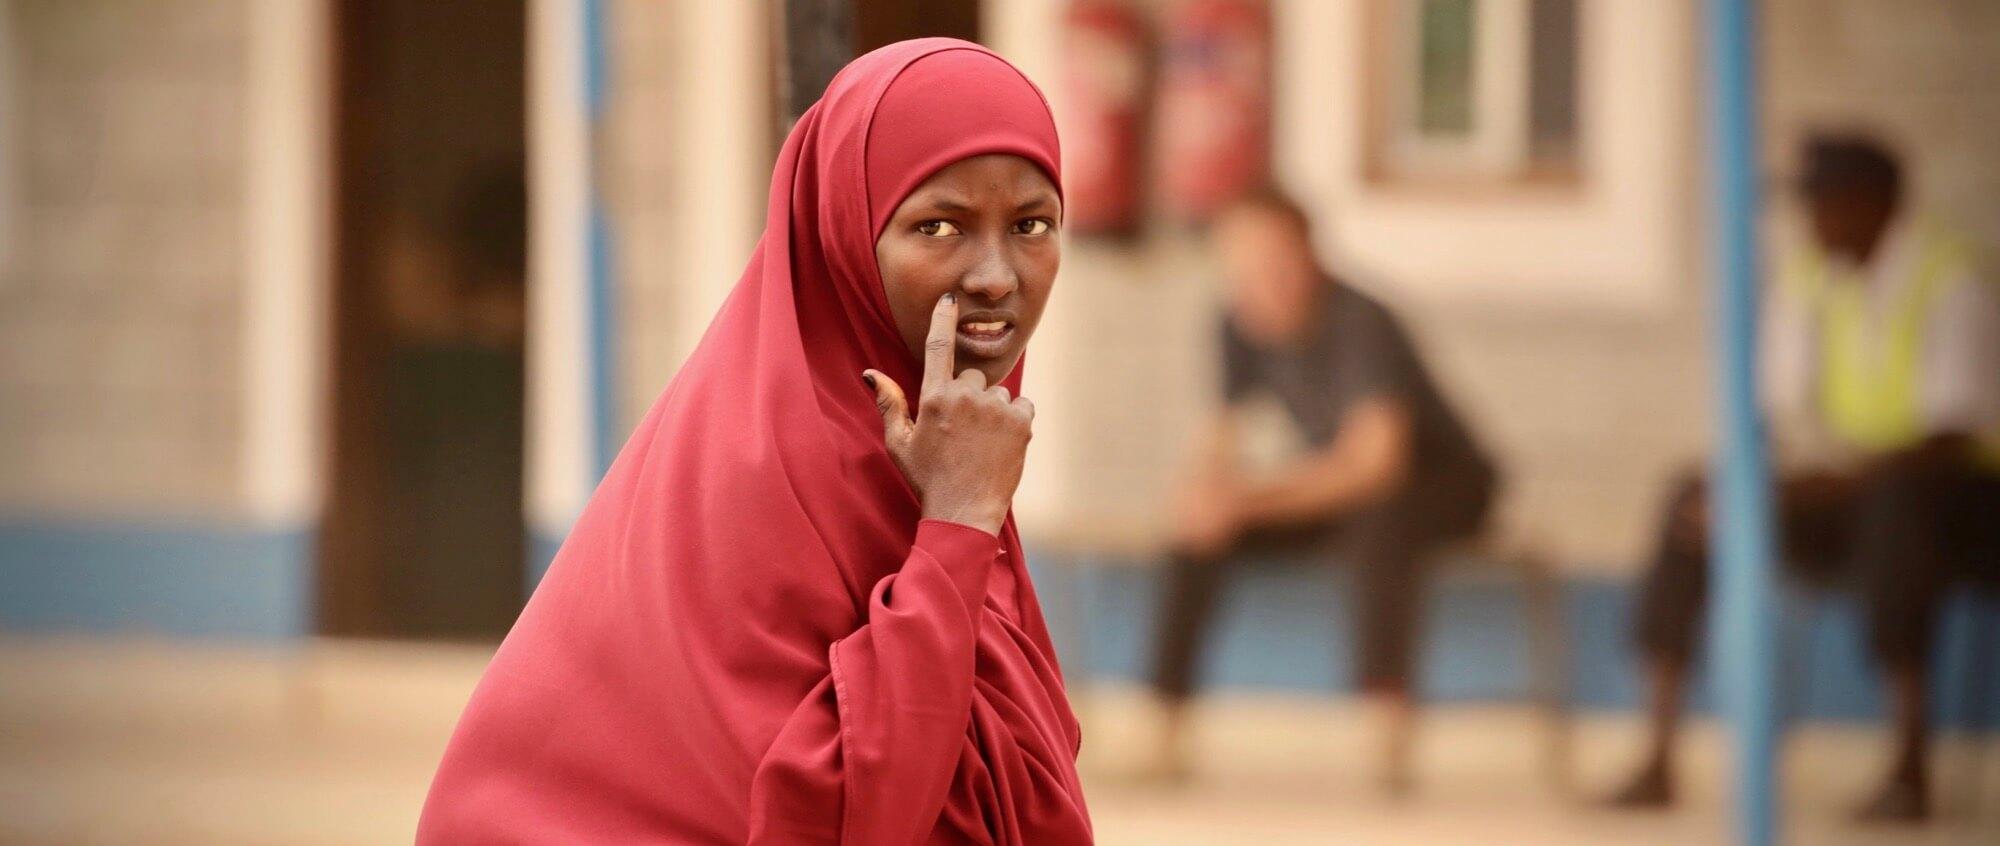 A Somali woman in Dadaab refugee camp